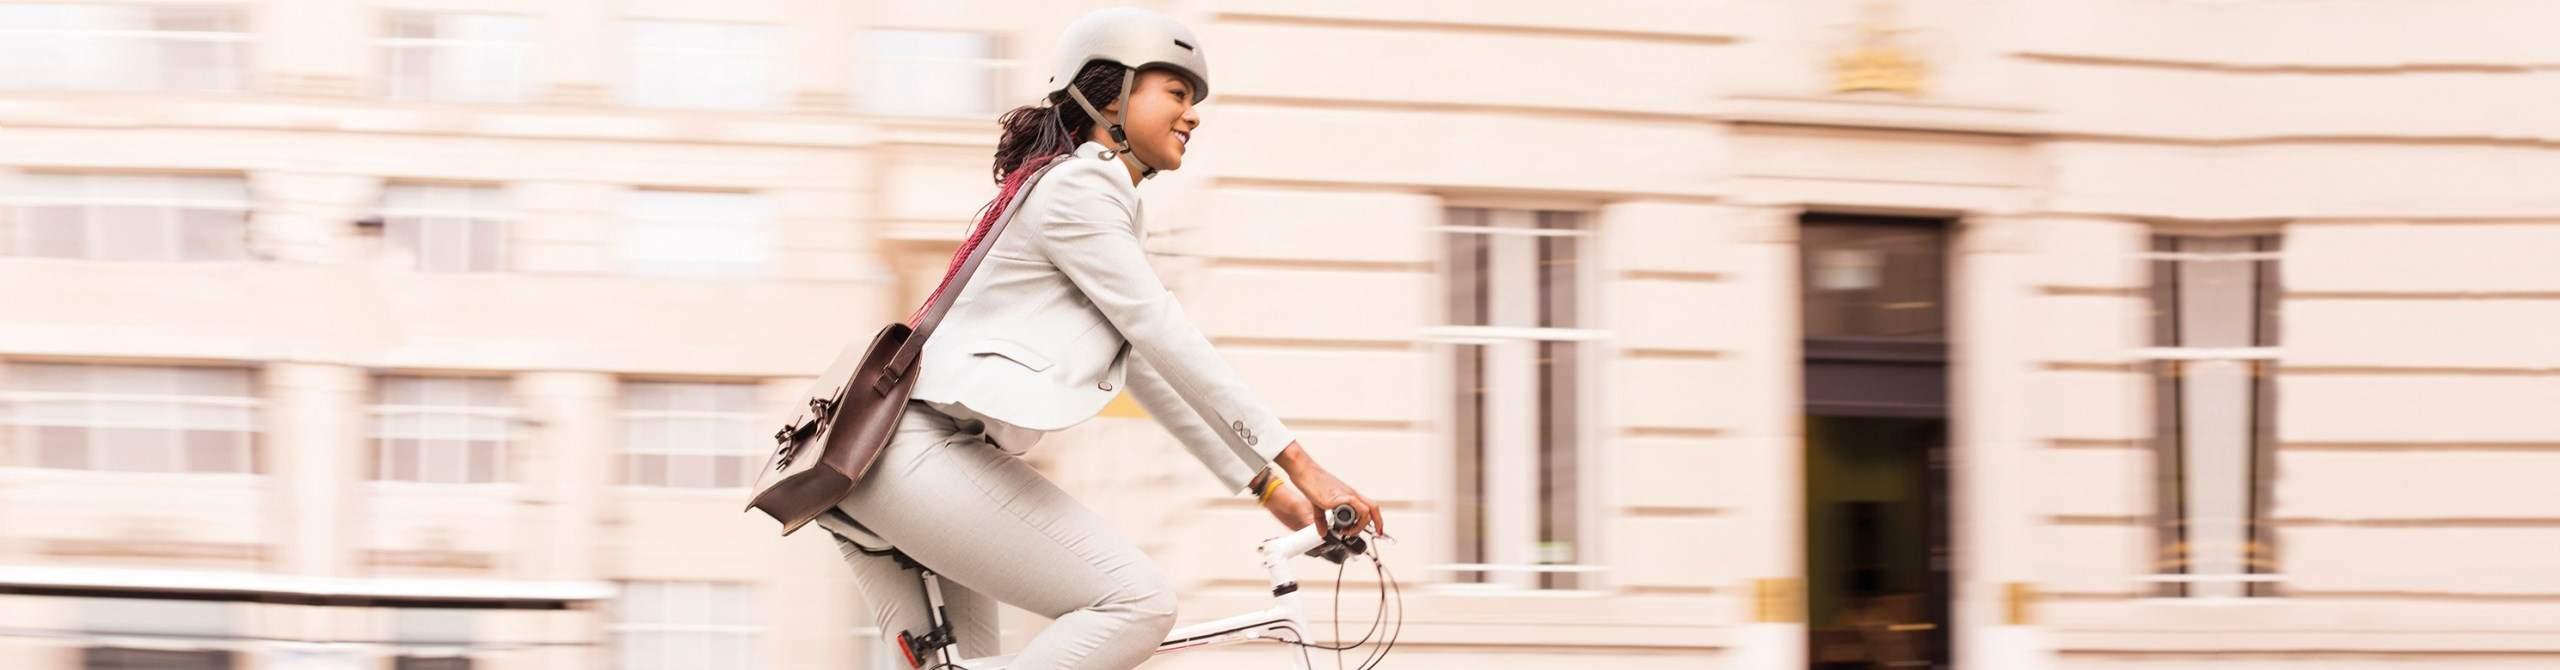 Radfahrerin in urbaner Umgebung